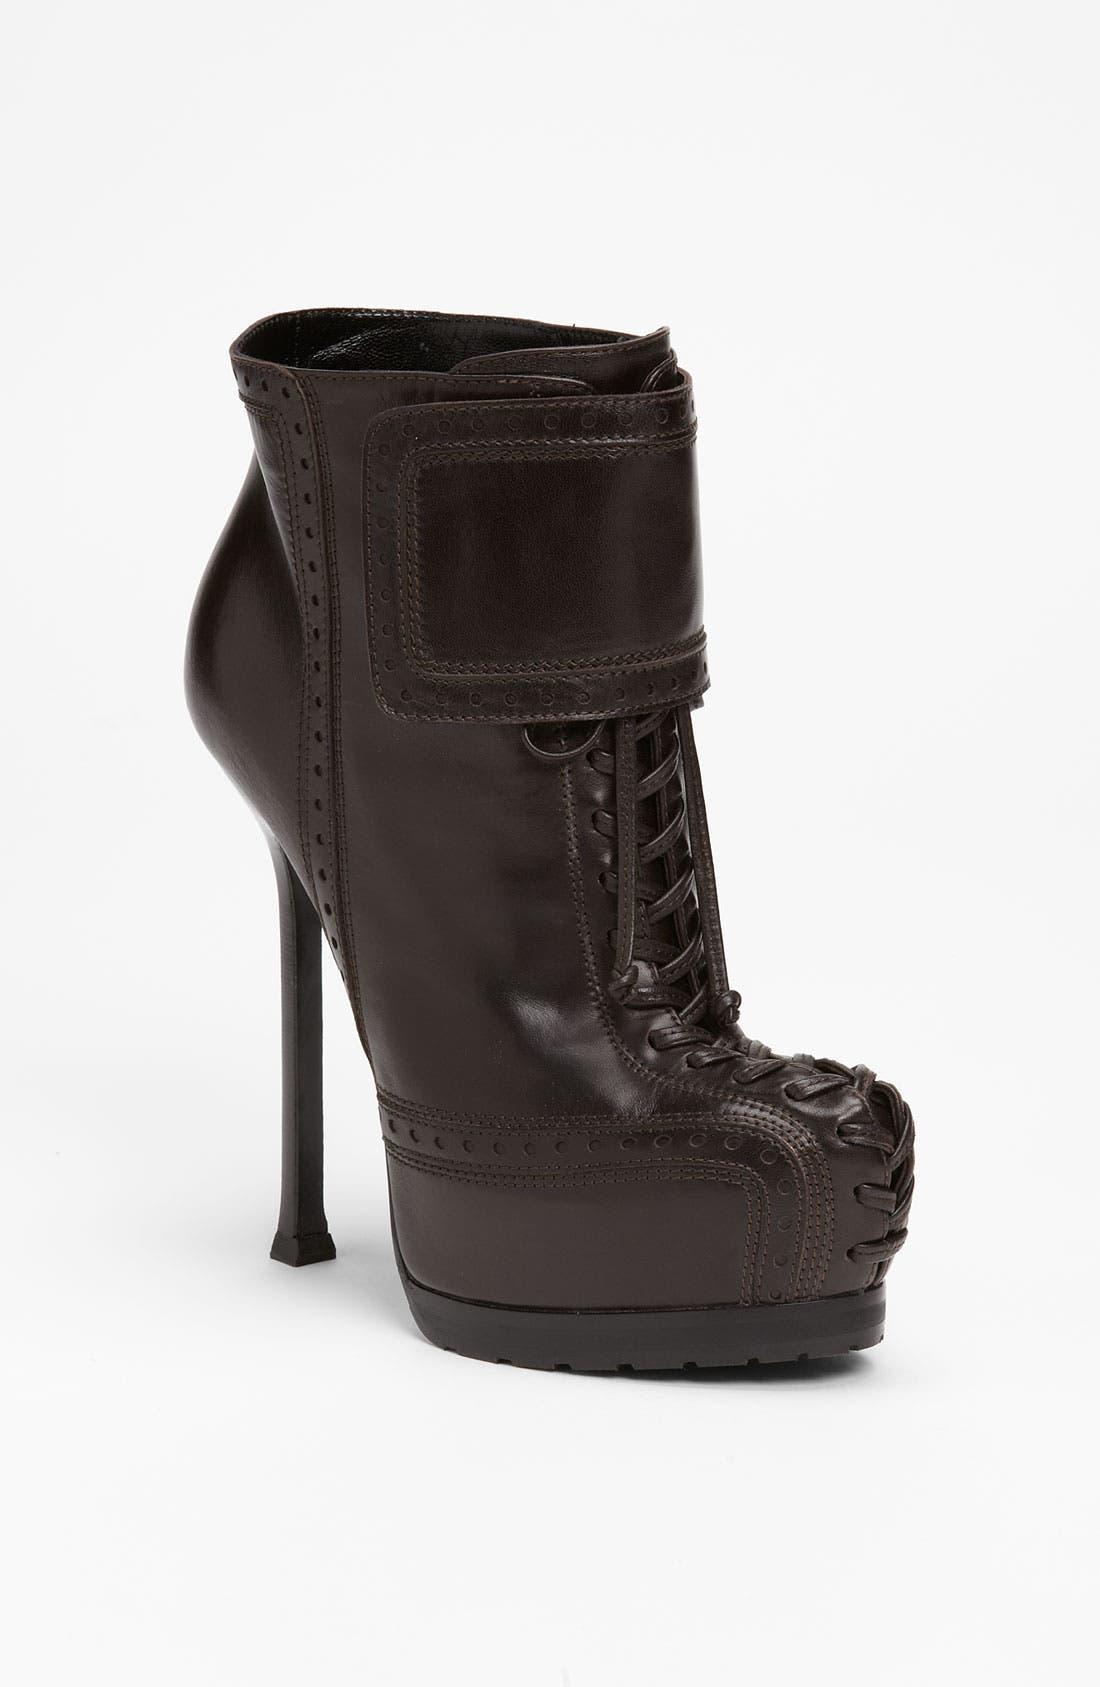 Alternate Image 1 Selected - Yves Saint Laurent 'Tribtoo' Ankle Boot